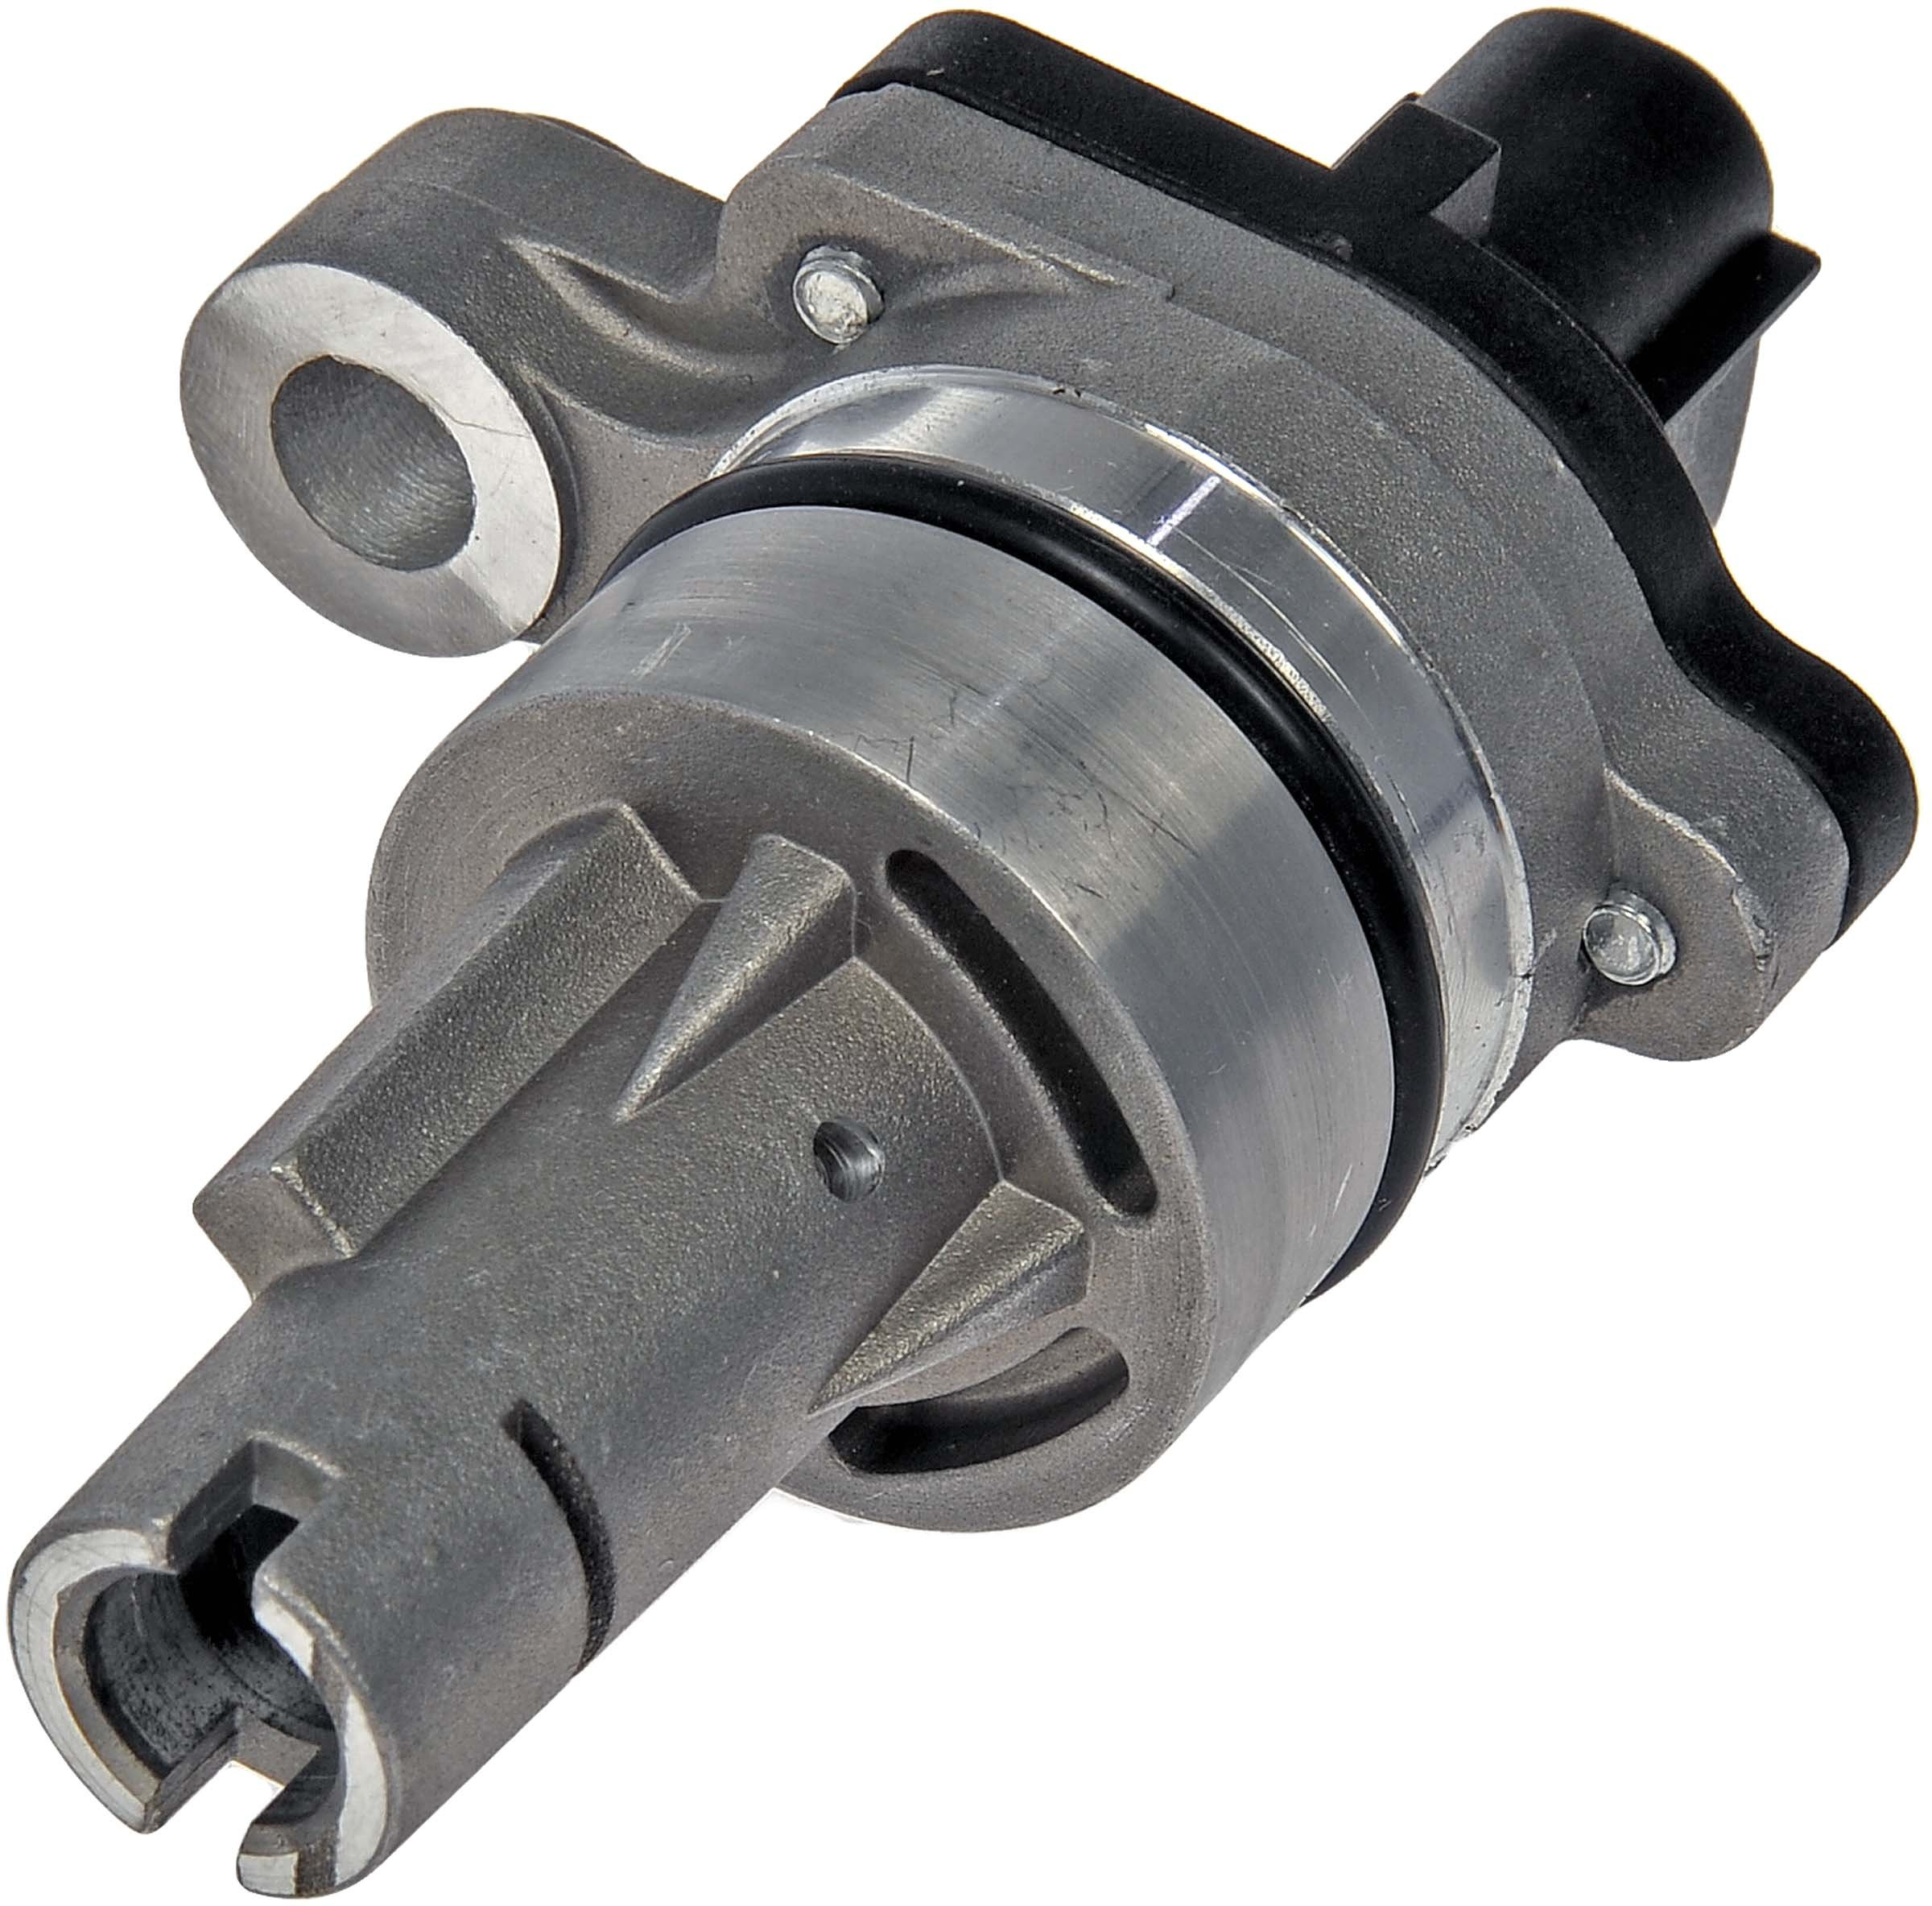 Dorman 917-664 Transmission Output Speed Sensor by Dorman